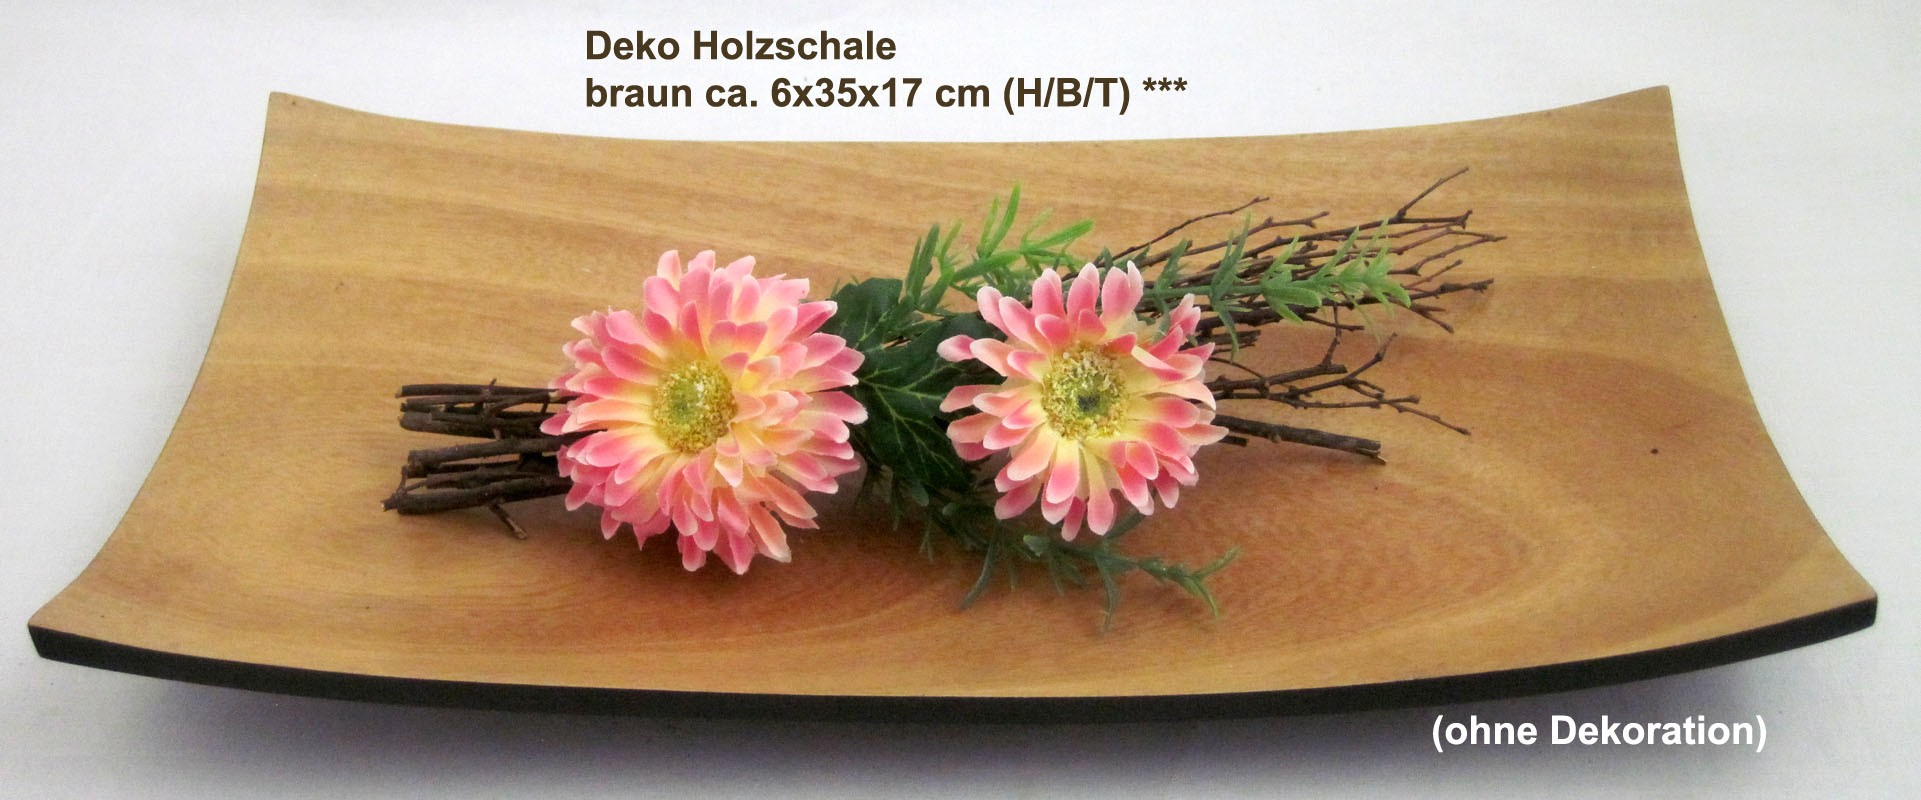 Deko Holzschale braun ca. 6x35x17 cm (H/B/T)